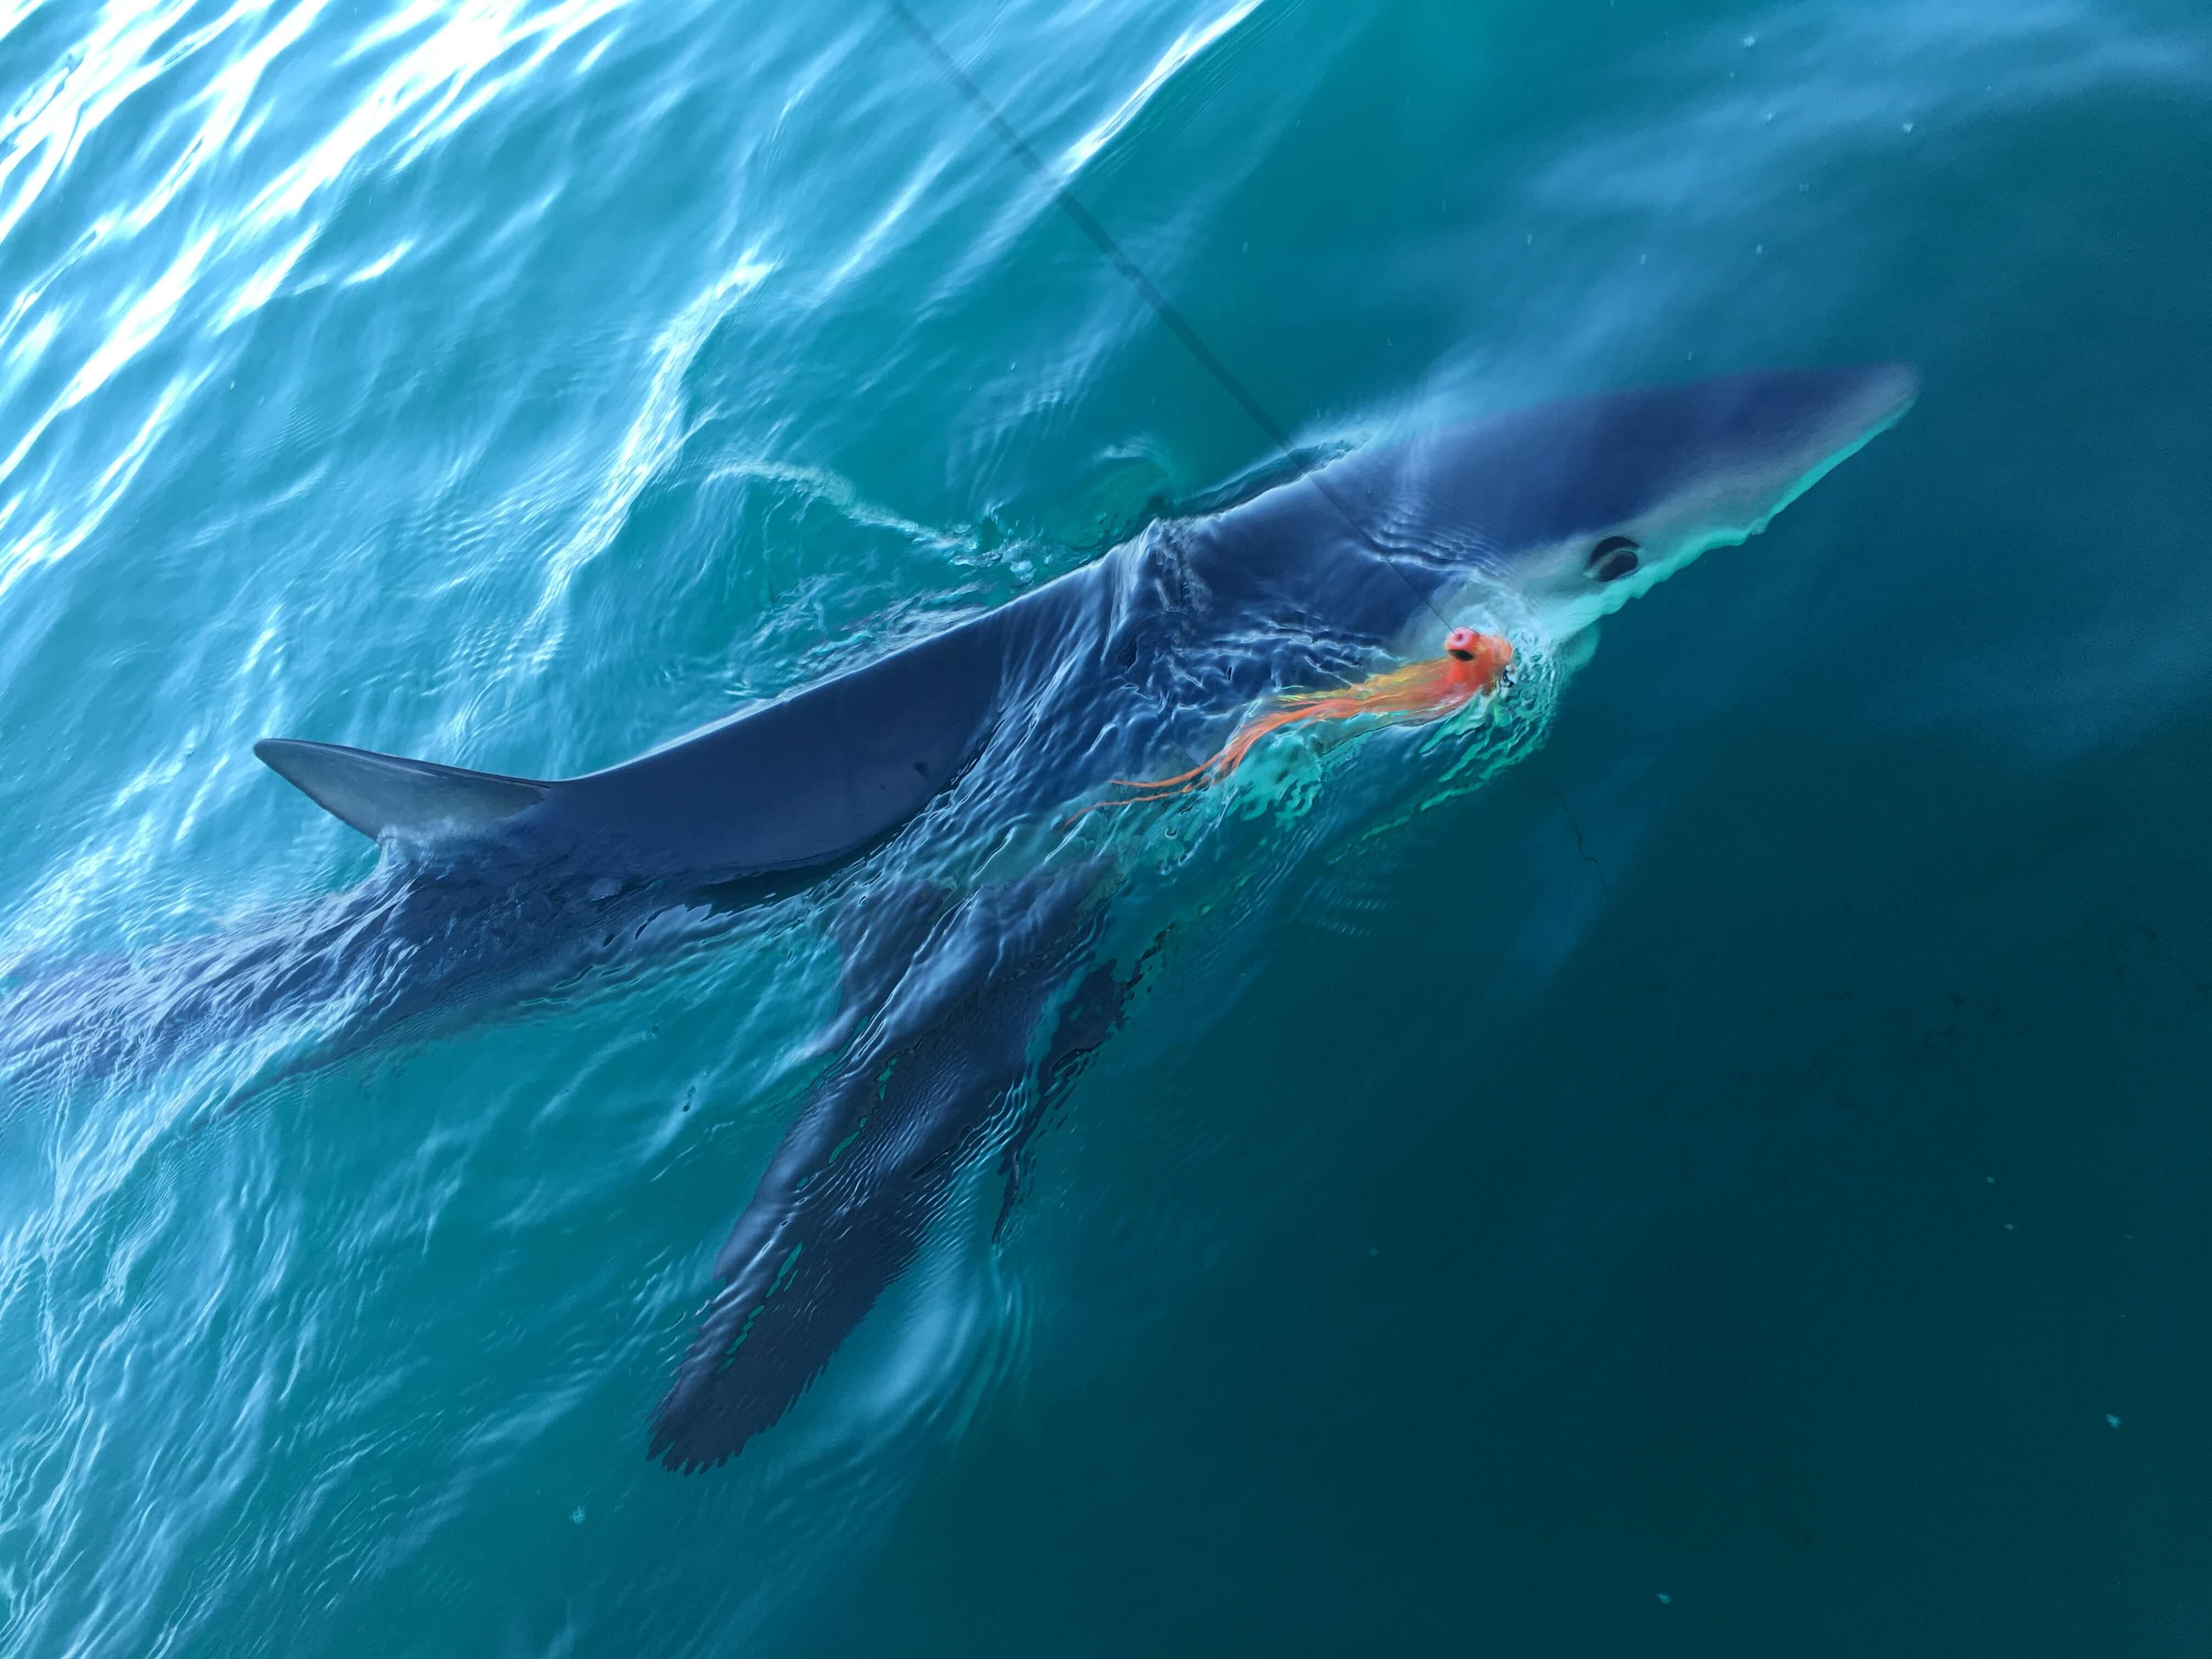 Blue-Shark-Fly-Fishing-California-Fun